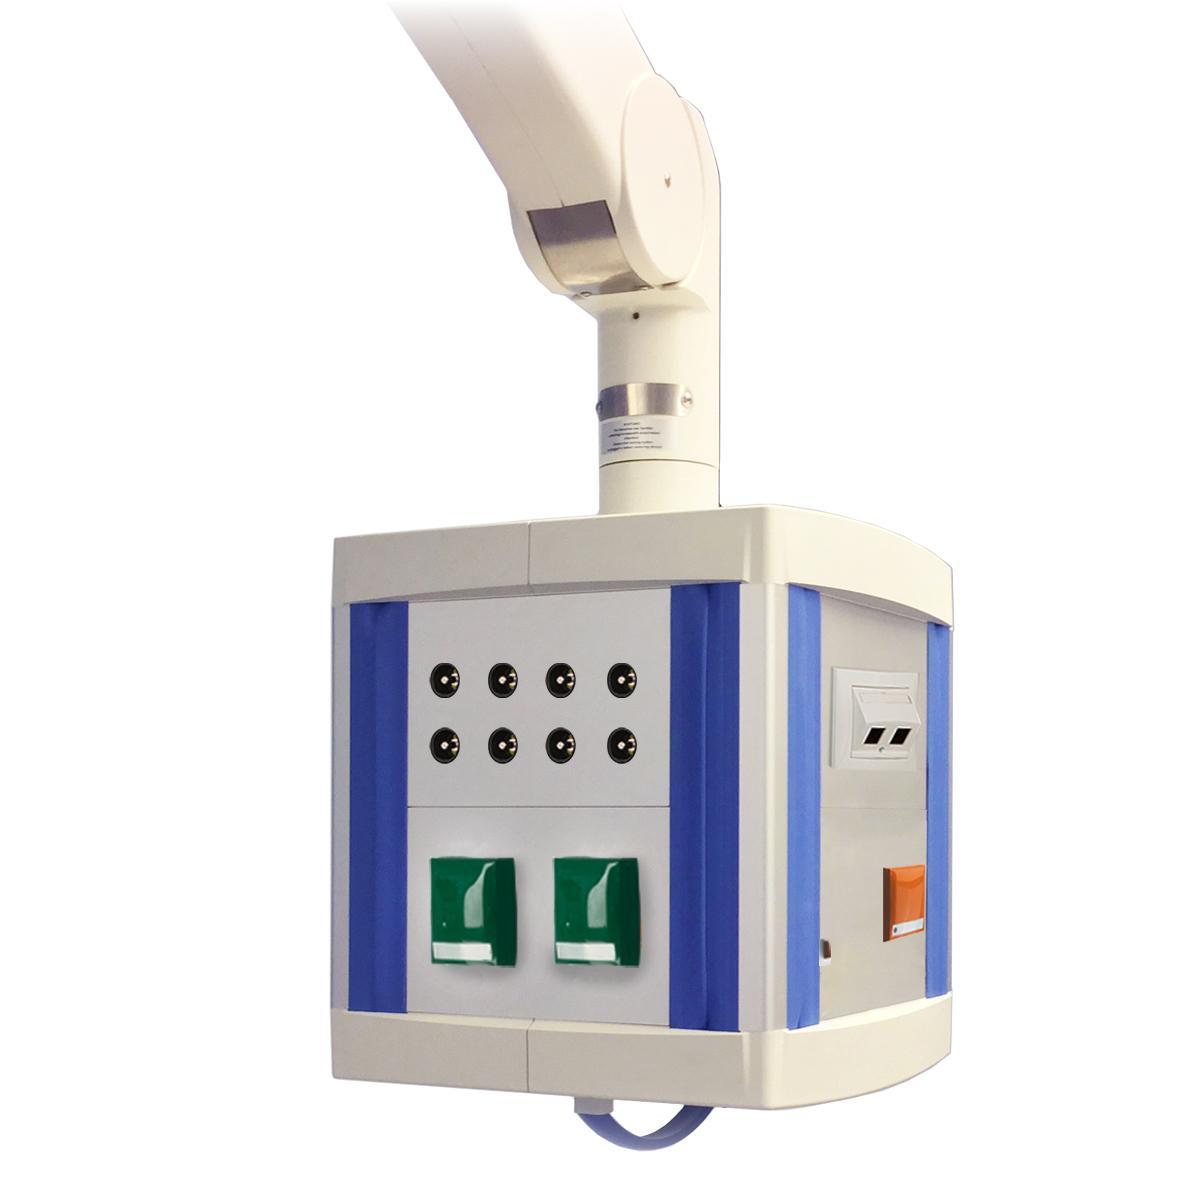 Hillrom FCS 300 Electro Cube Equipment Boom